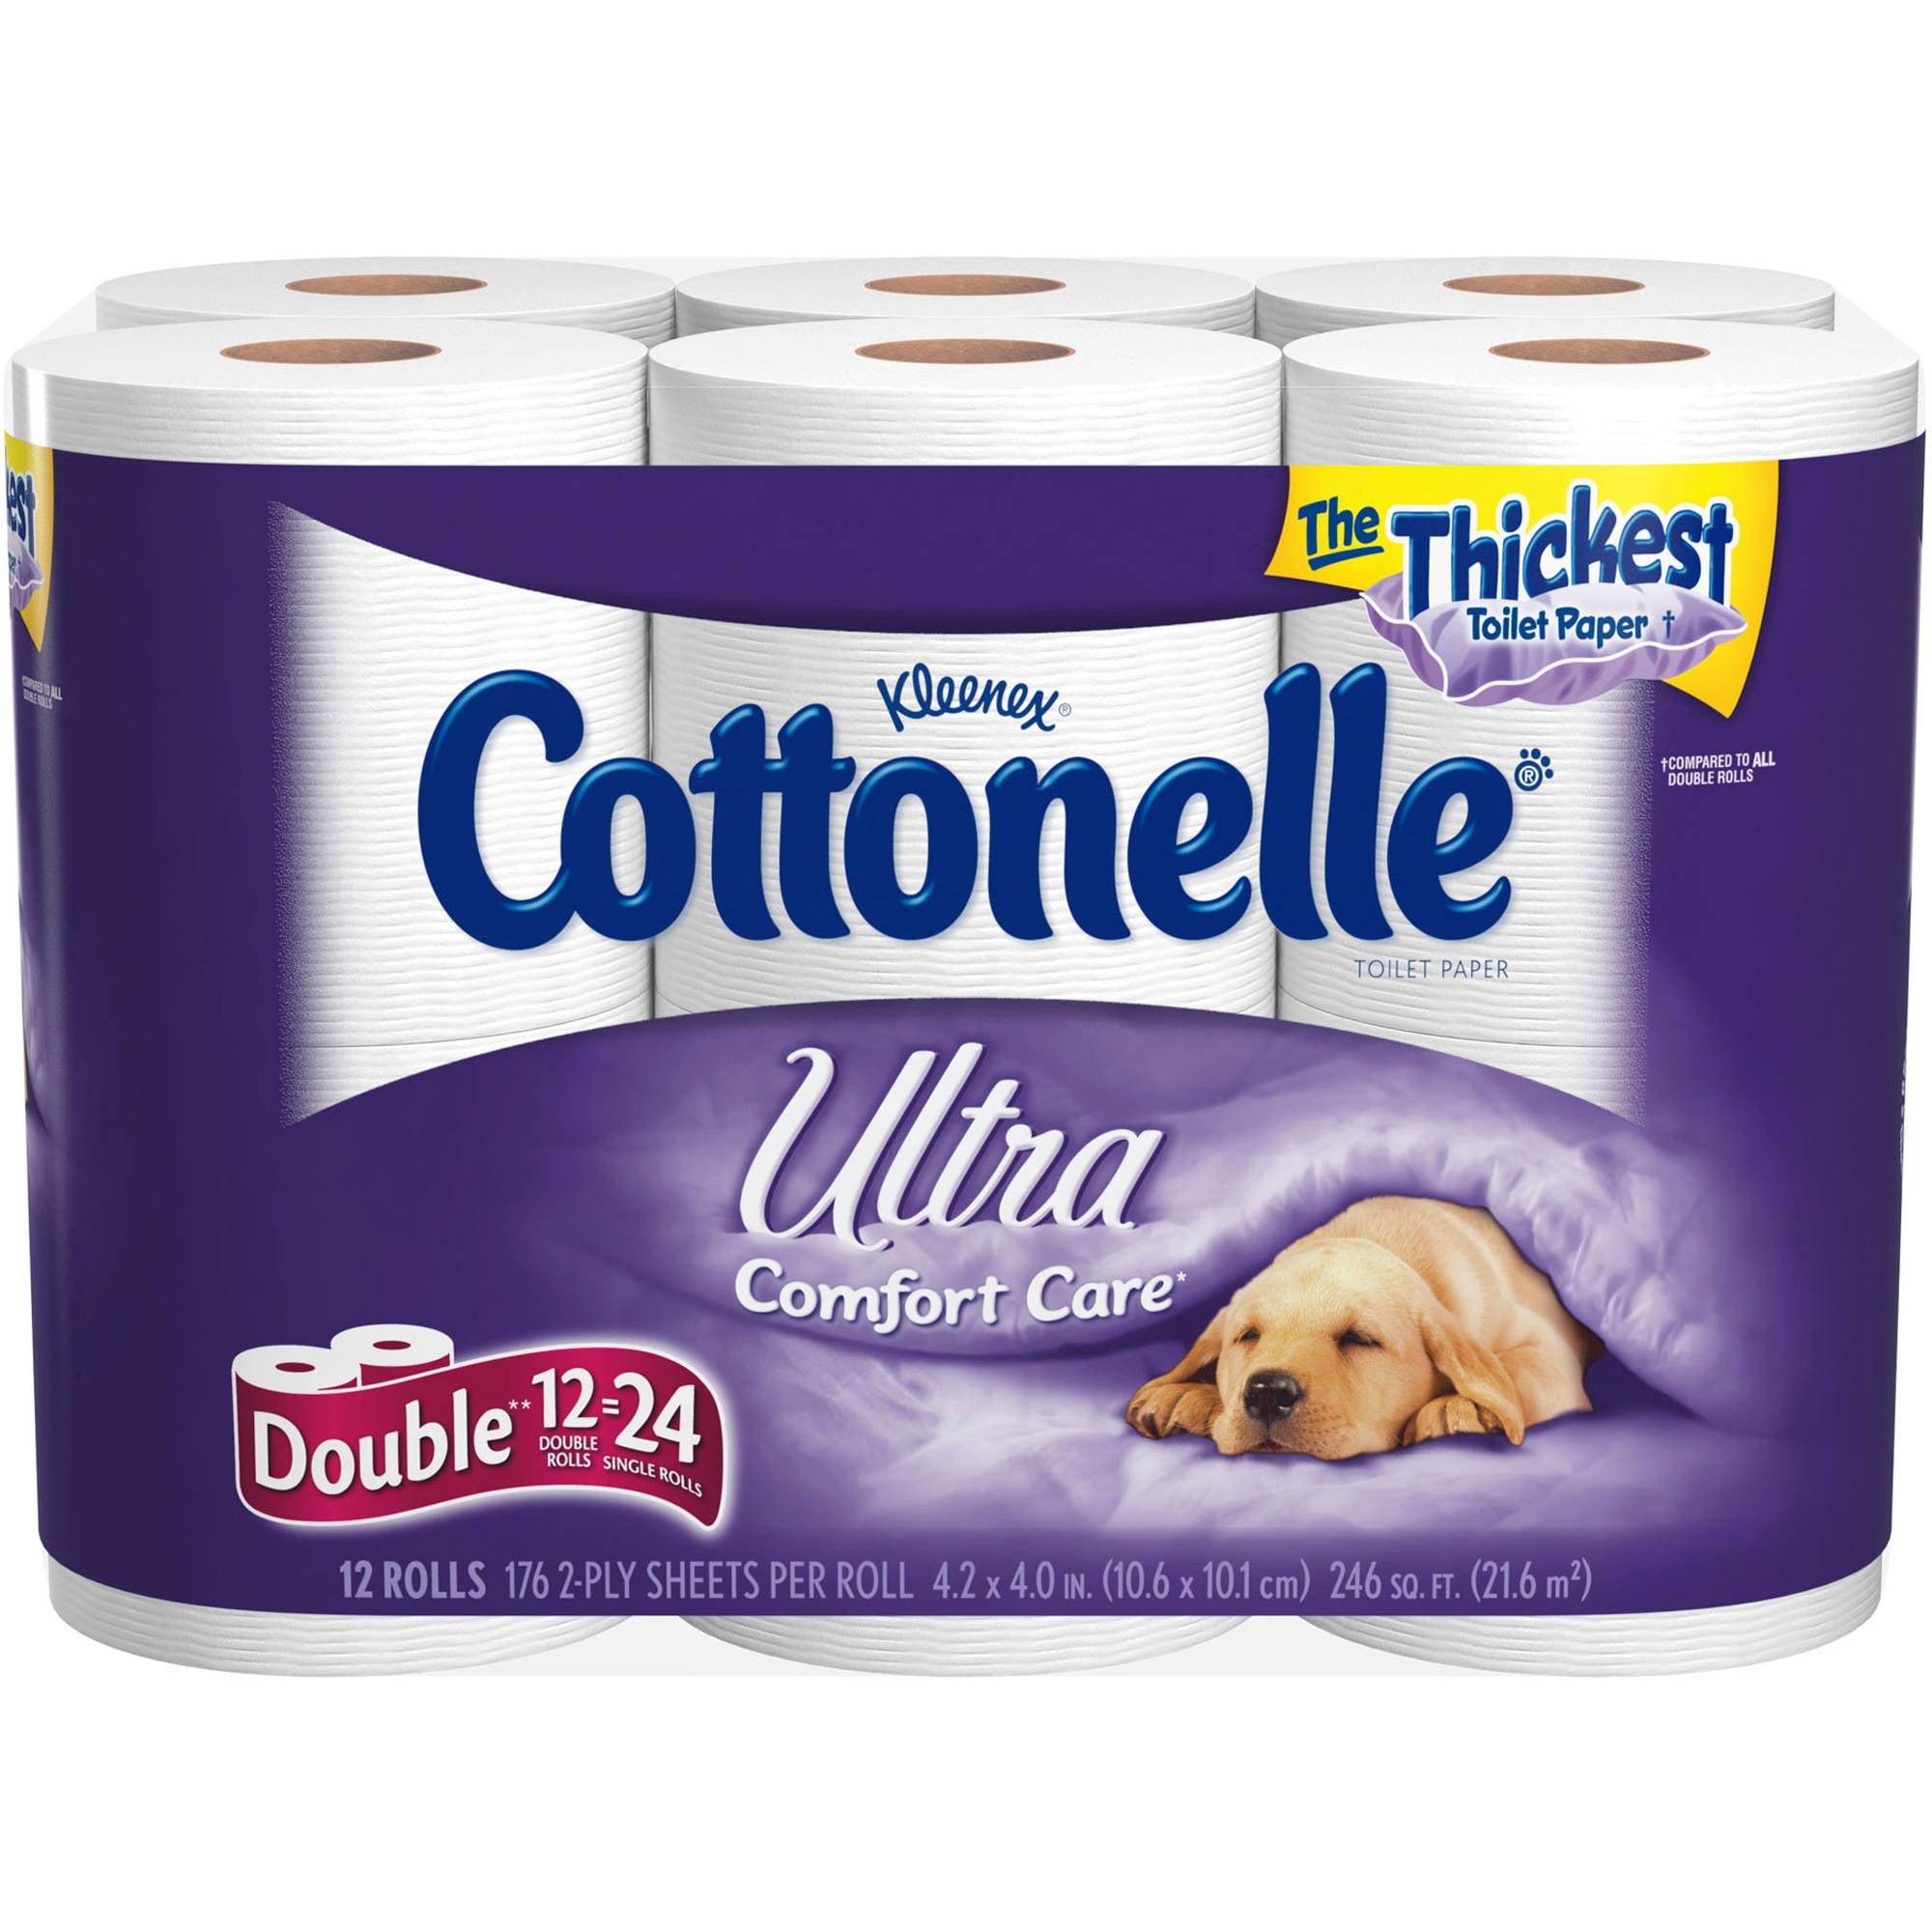 Kleenex Cottonelle Ultra Toilet Paper, 12 Pack